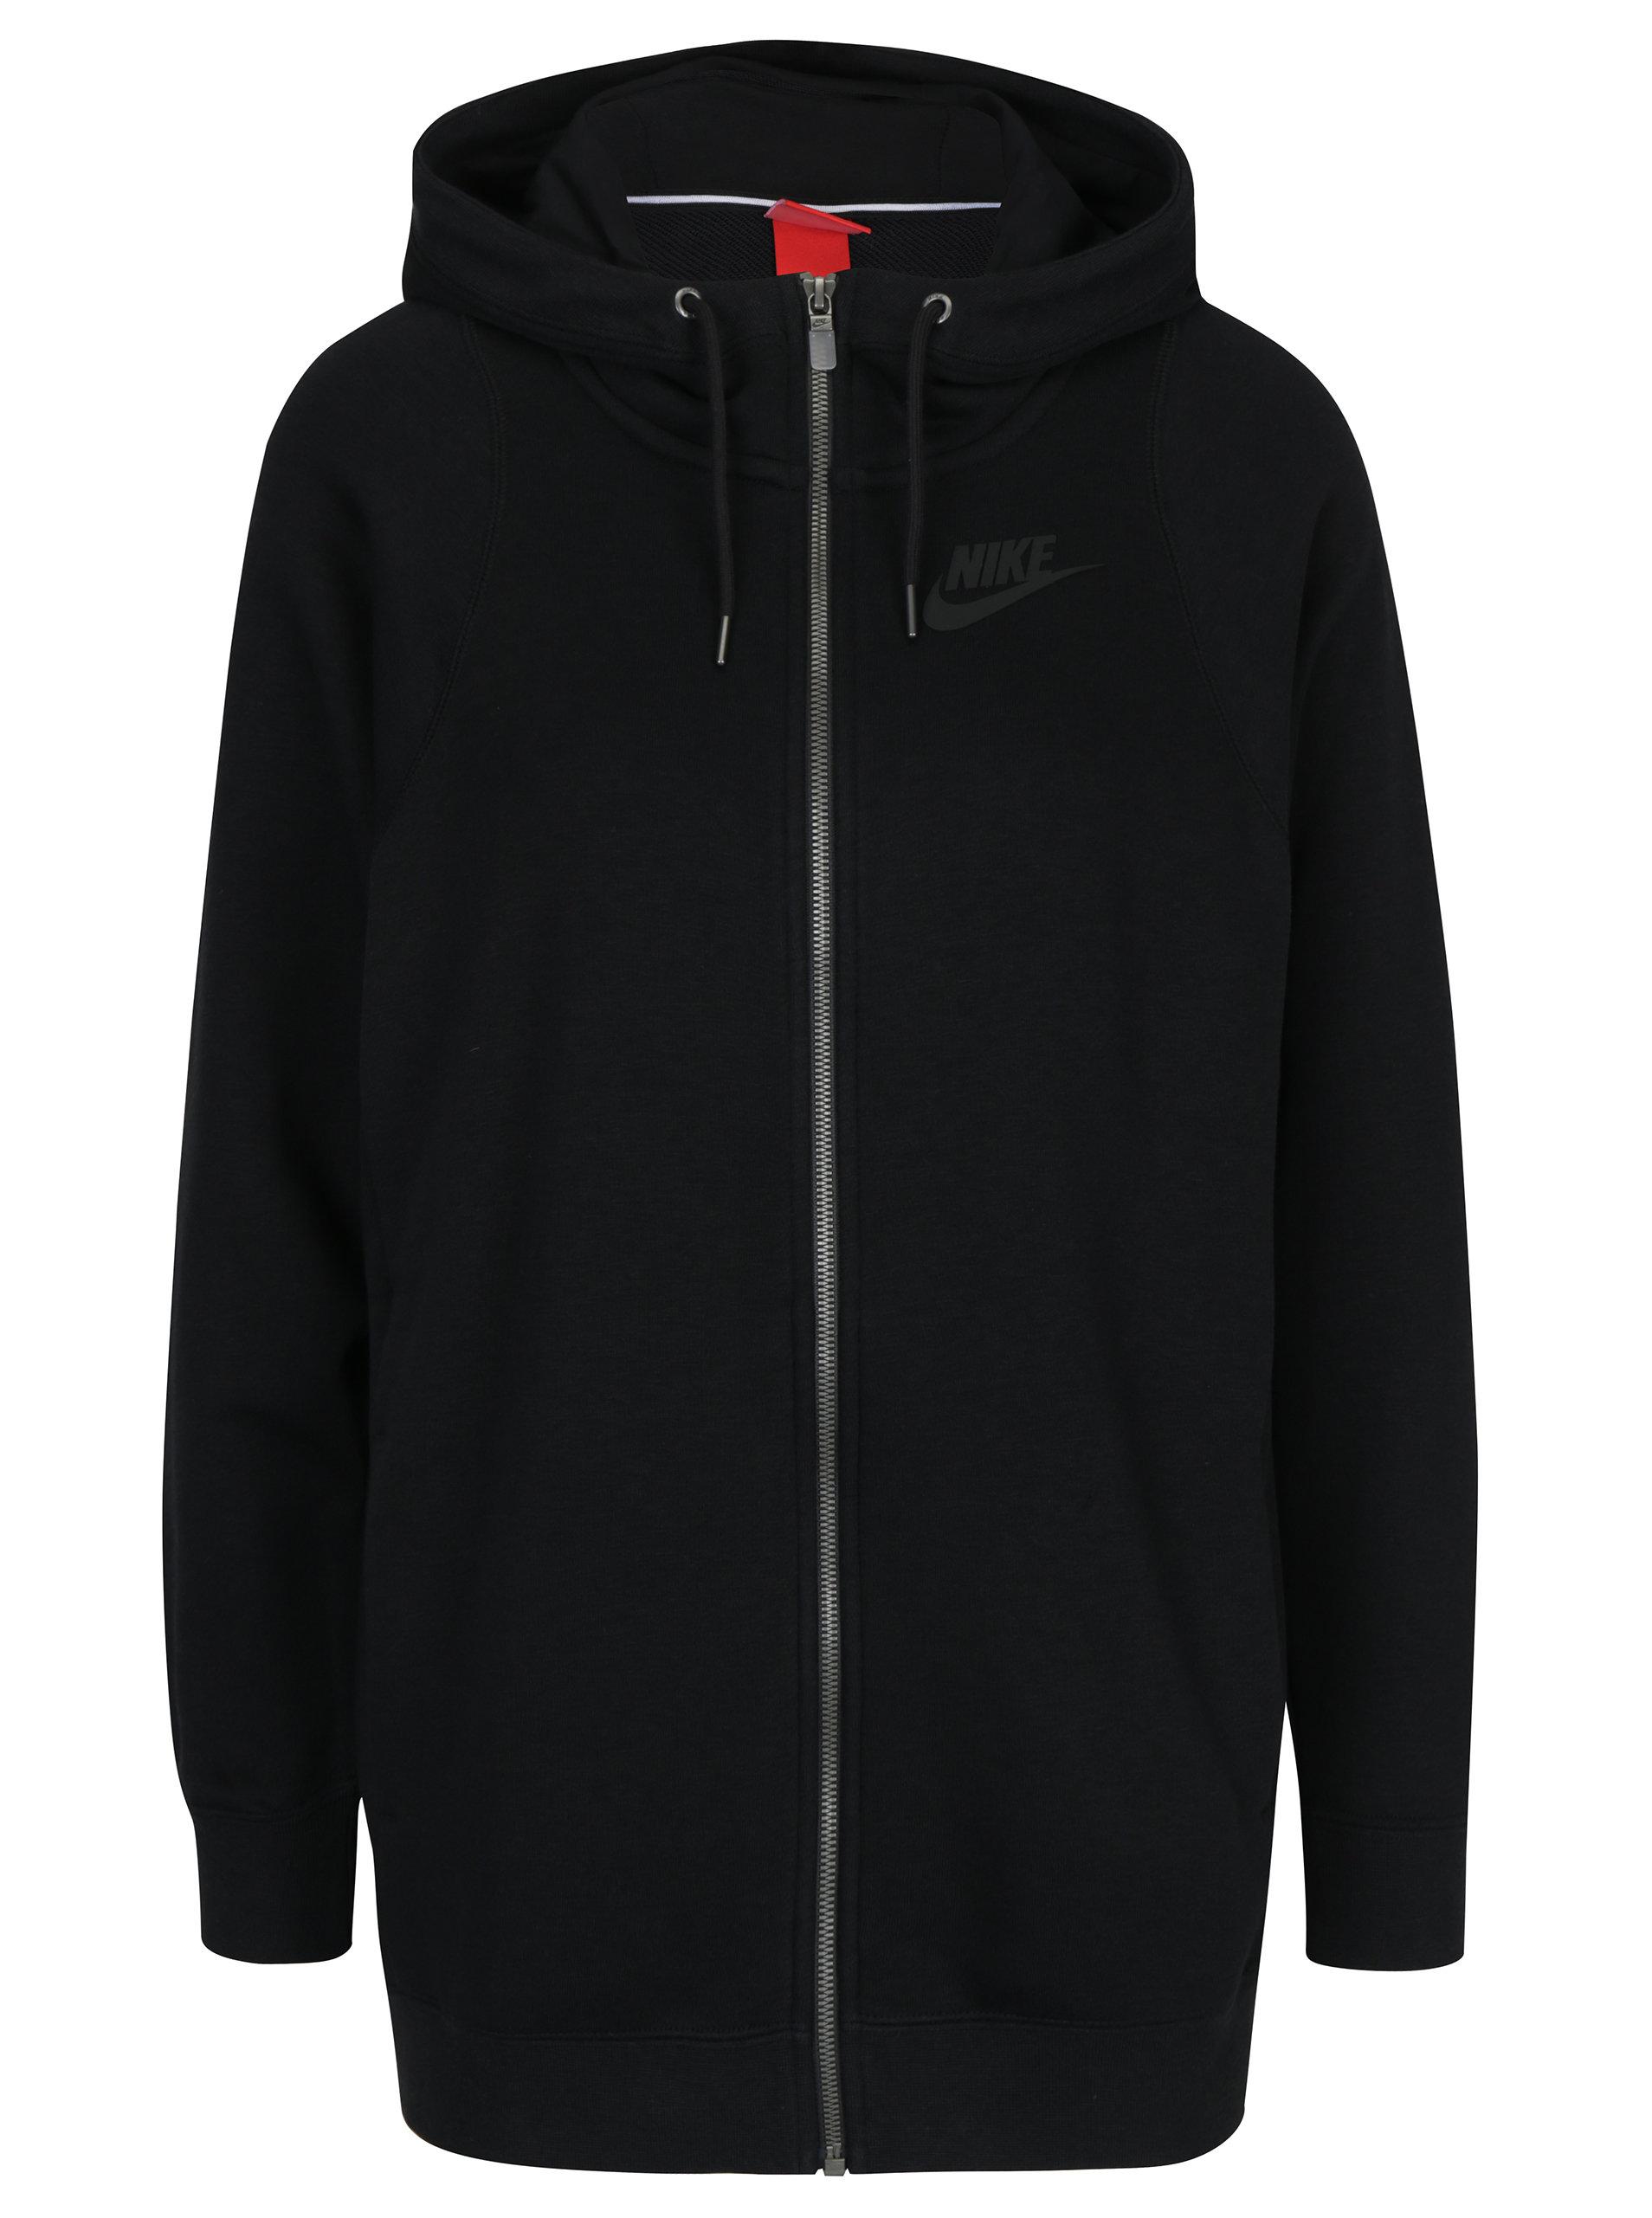 c7e3bef40e Čierna dámska mikina s kapucňou Nike Sportswear Modern ...